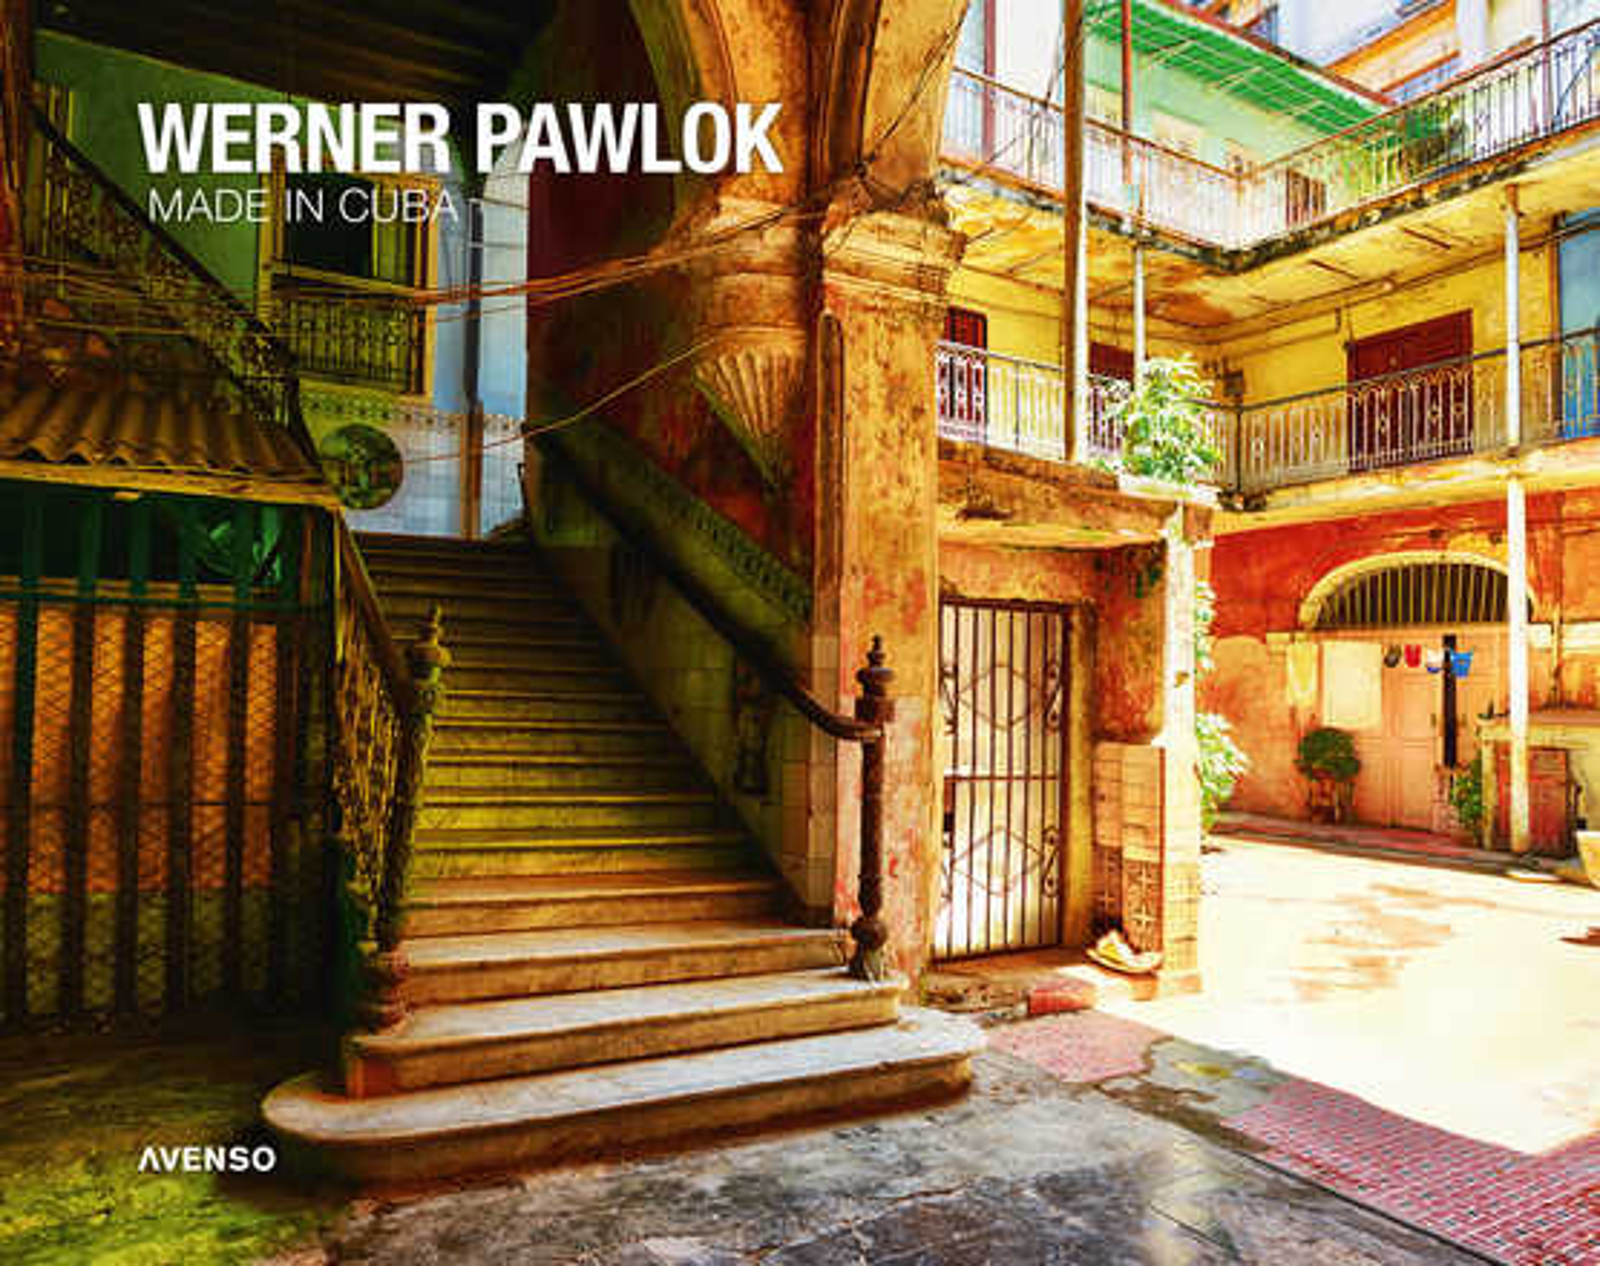 ARTIST BOOK - Made in Cuba - Werner Pawlok